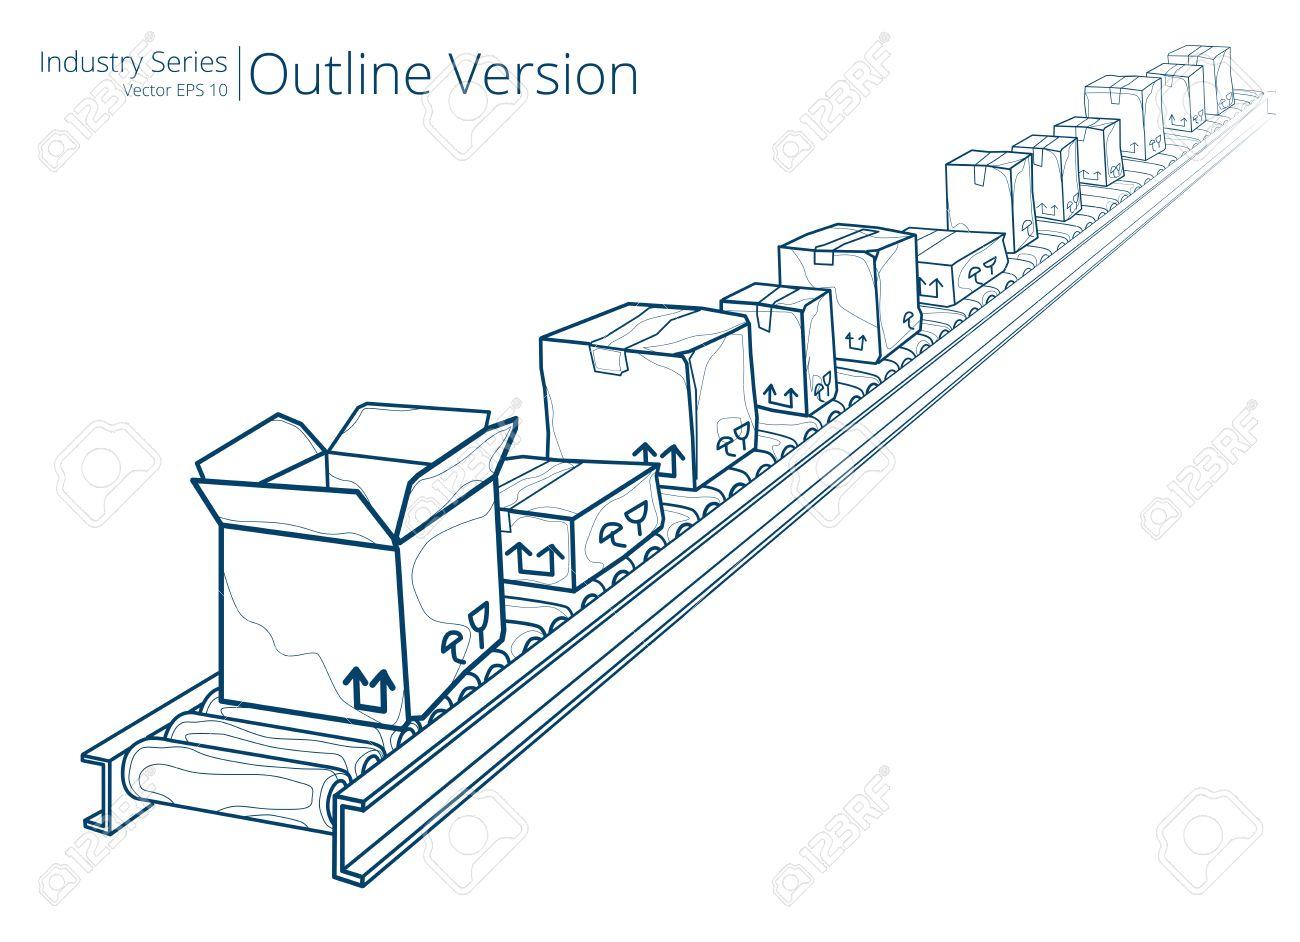 Conveyor Belt. Vector illustration of conveyor belt, Outline Series. - 35111565